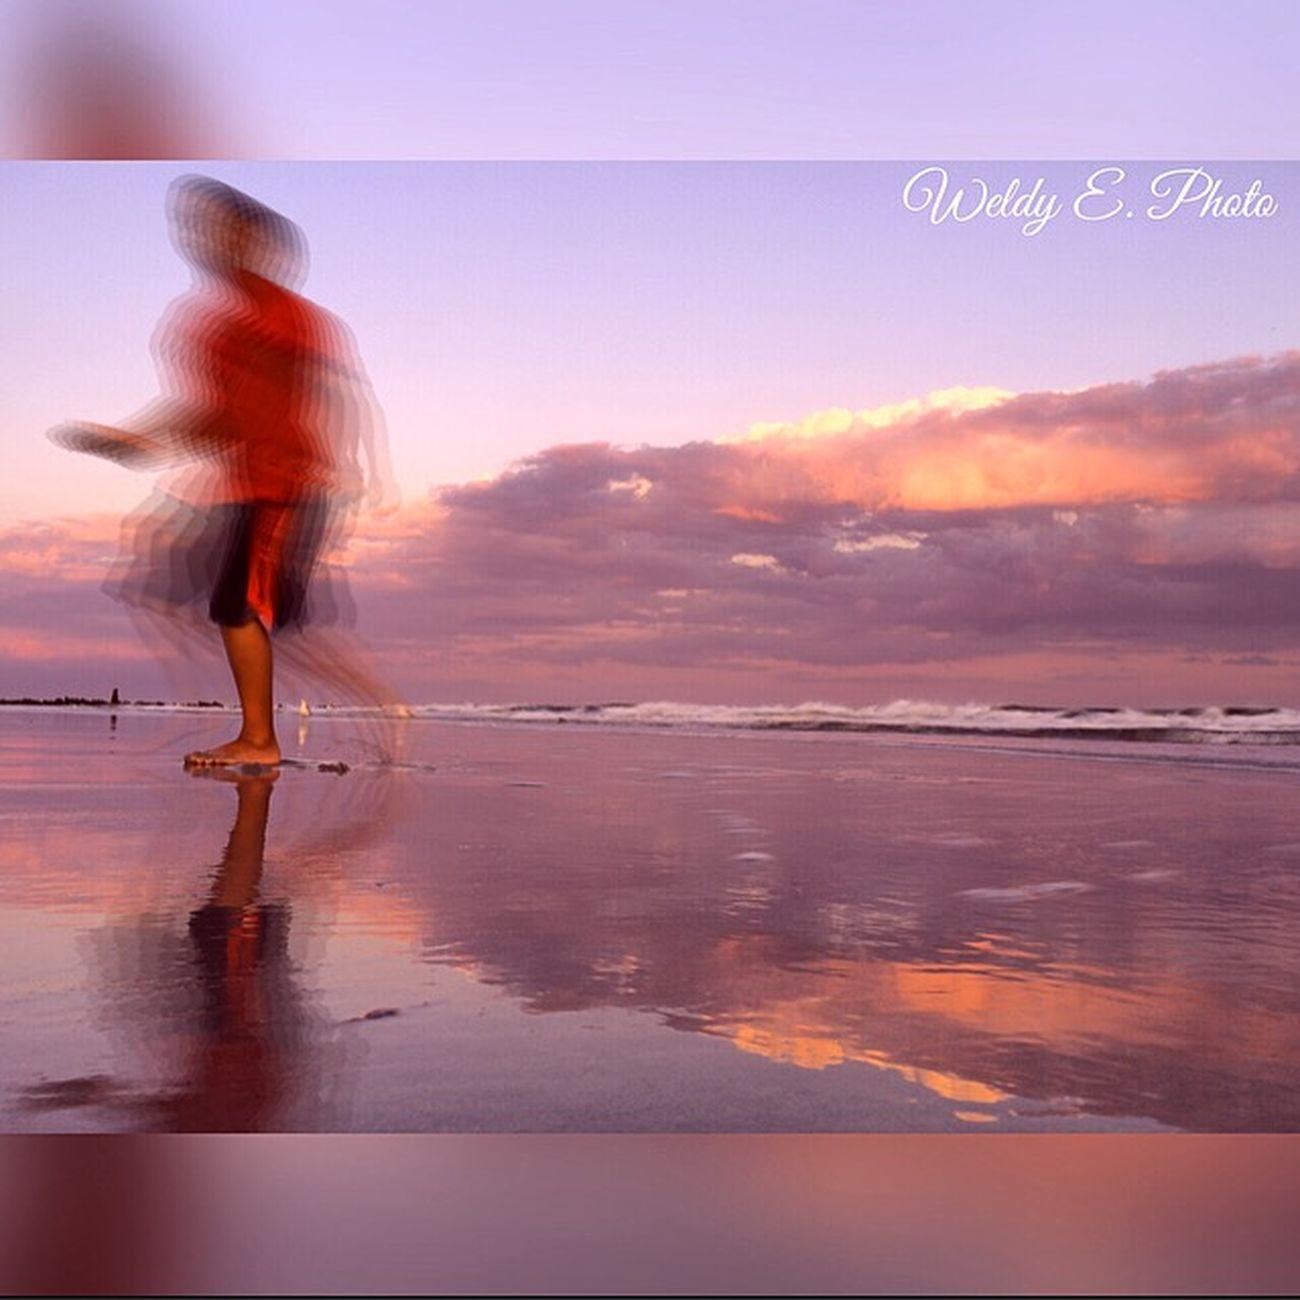 Sunset At Long Beach, NY Longexposurephotography EyeEm Best Shots - Long Exposure Long Exposure Shot Slowshutter World Visualmagic EyeEm Best Shots Beachphotography Sunset_collection EyeEm Sunset